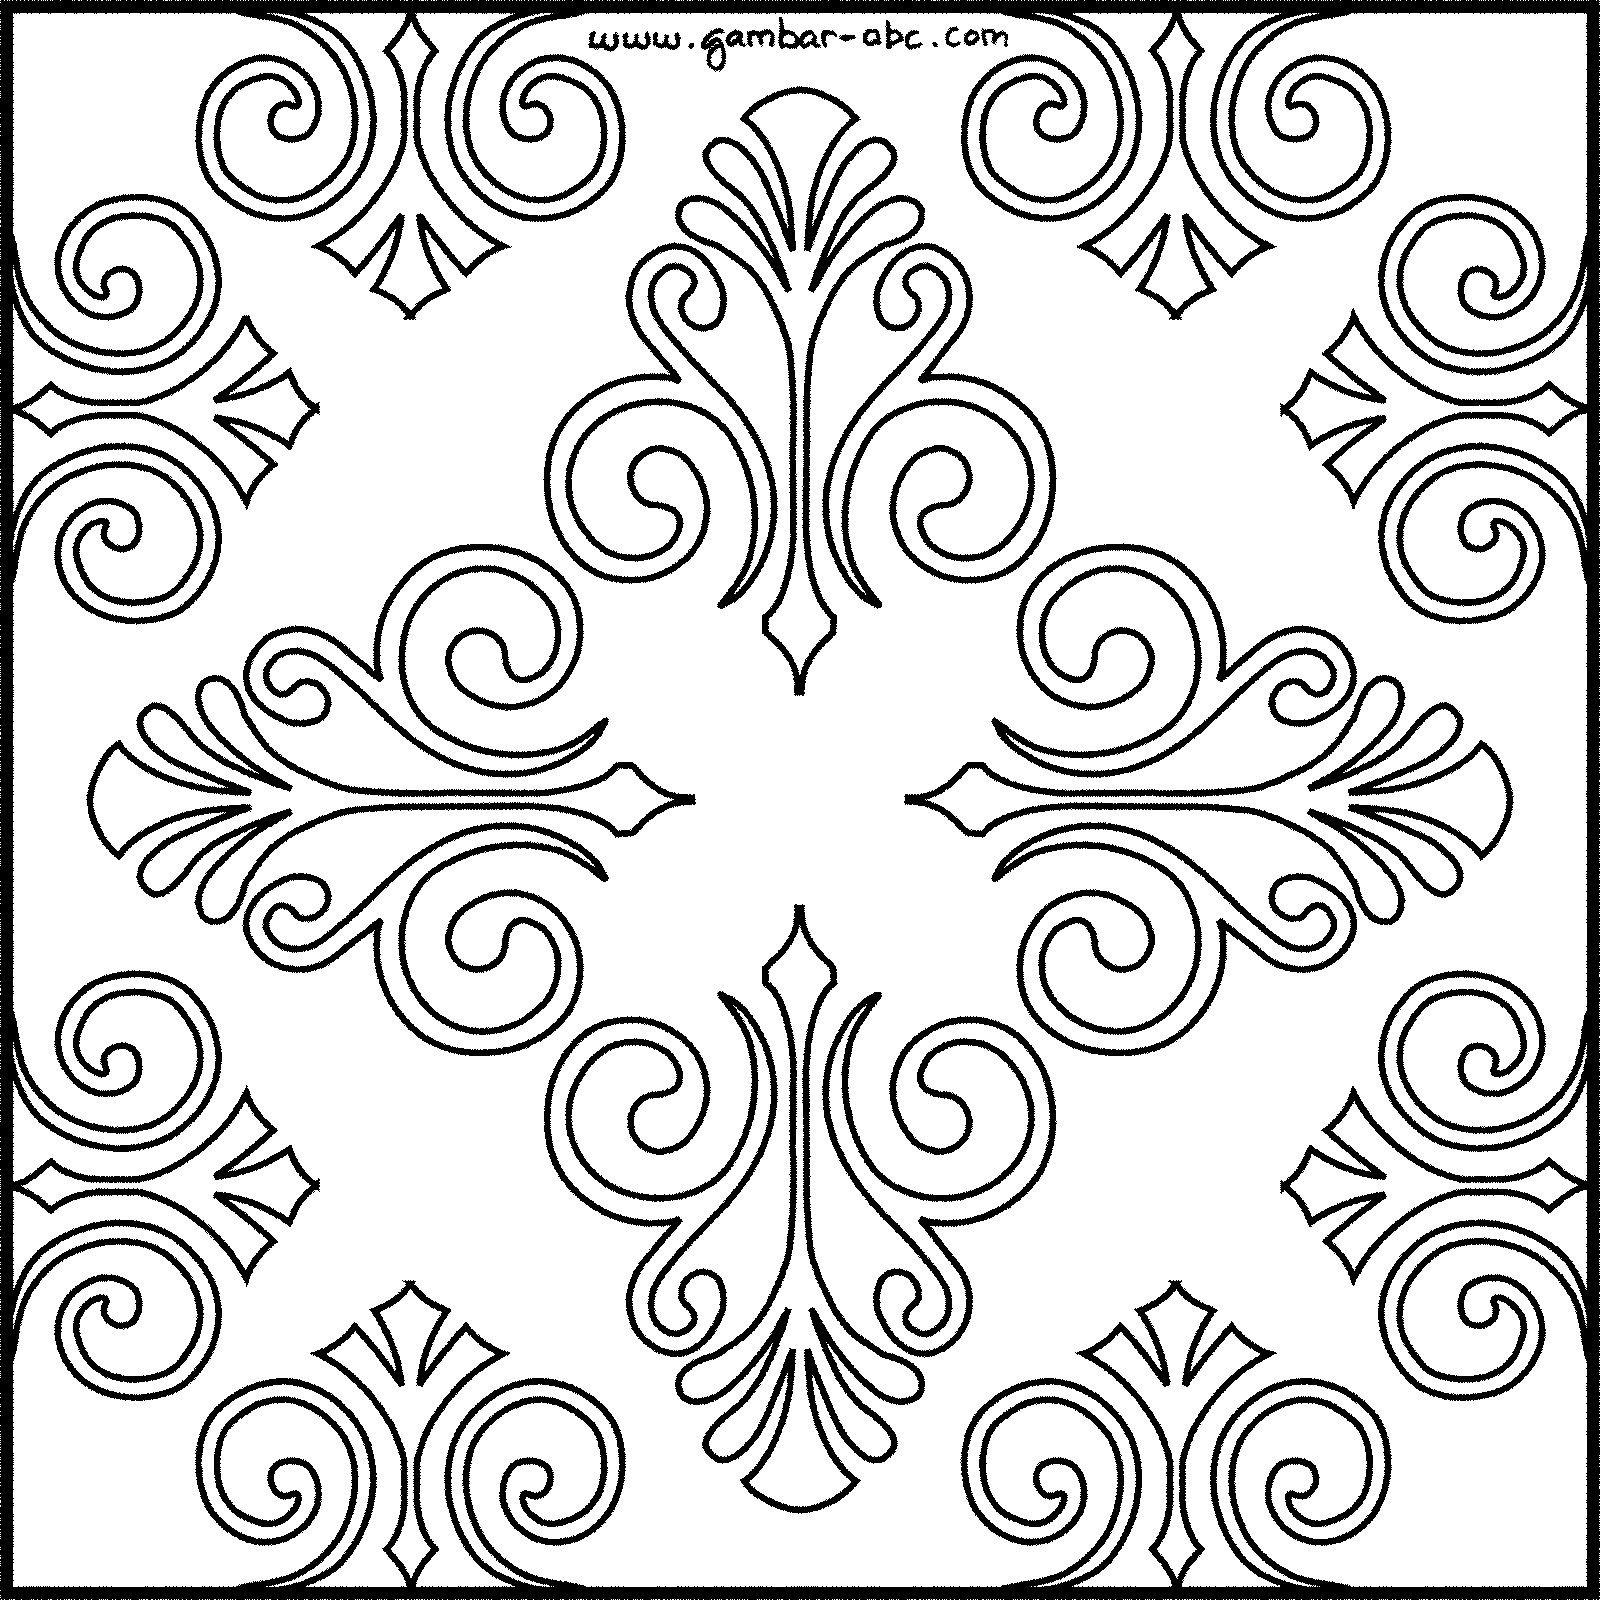 Gambar Motif Batik Bunga Sketsa Gambar Motif Batik Sederhana Batik ...